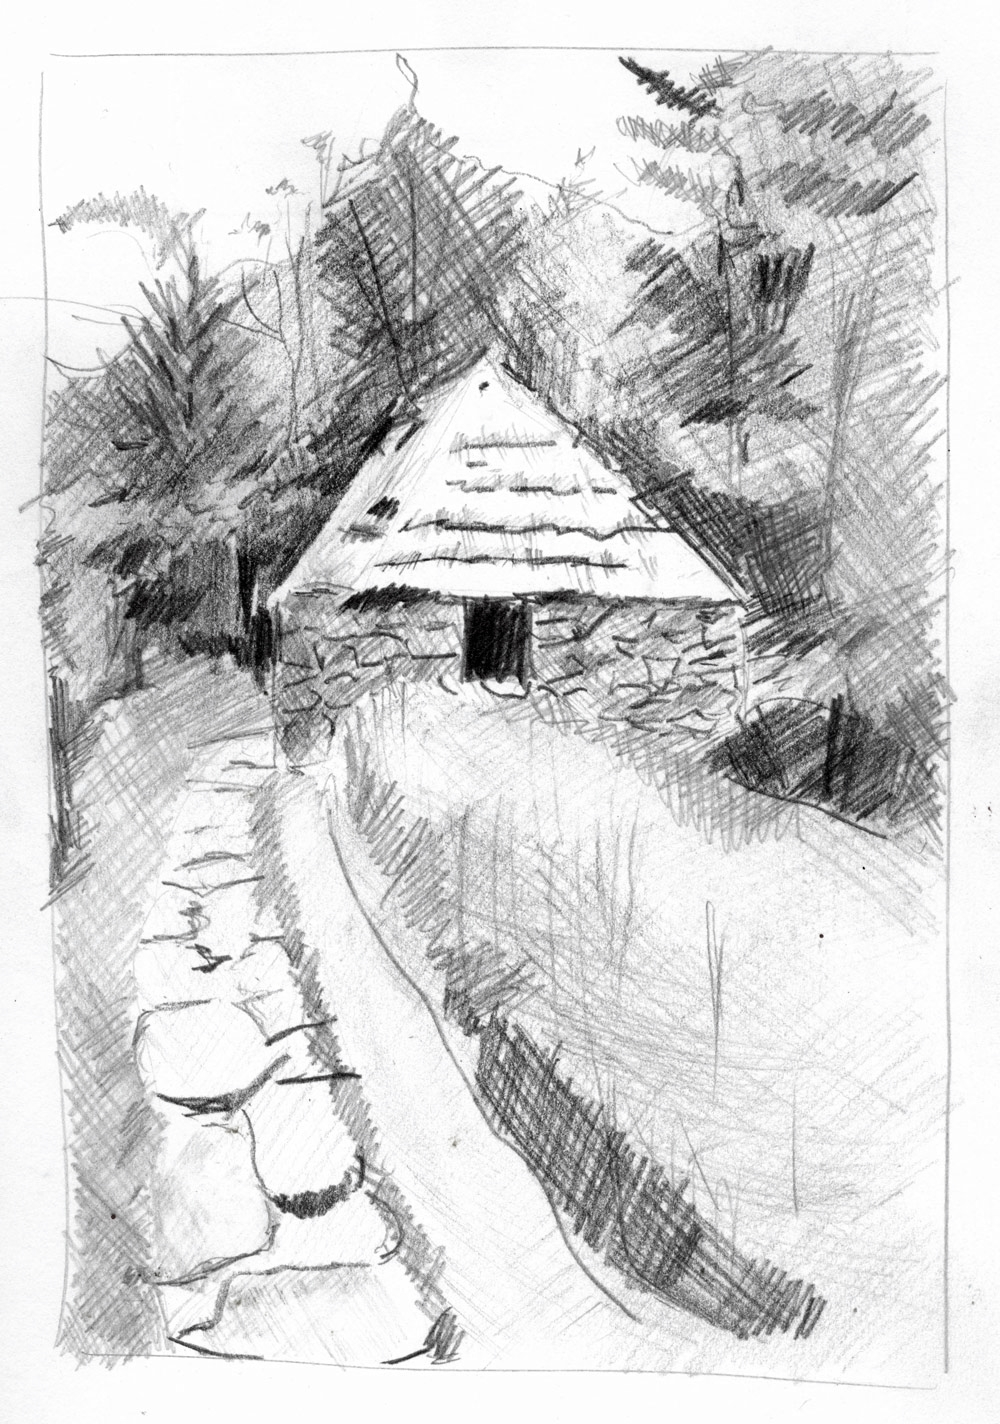 Cottage-sketch-1000px.jpg